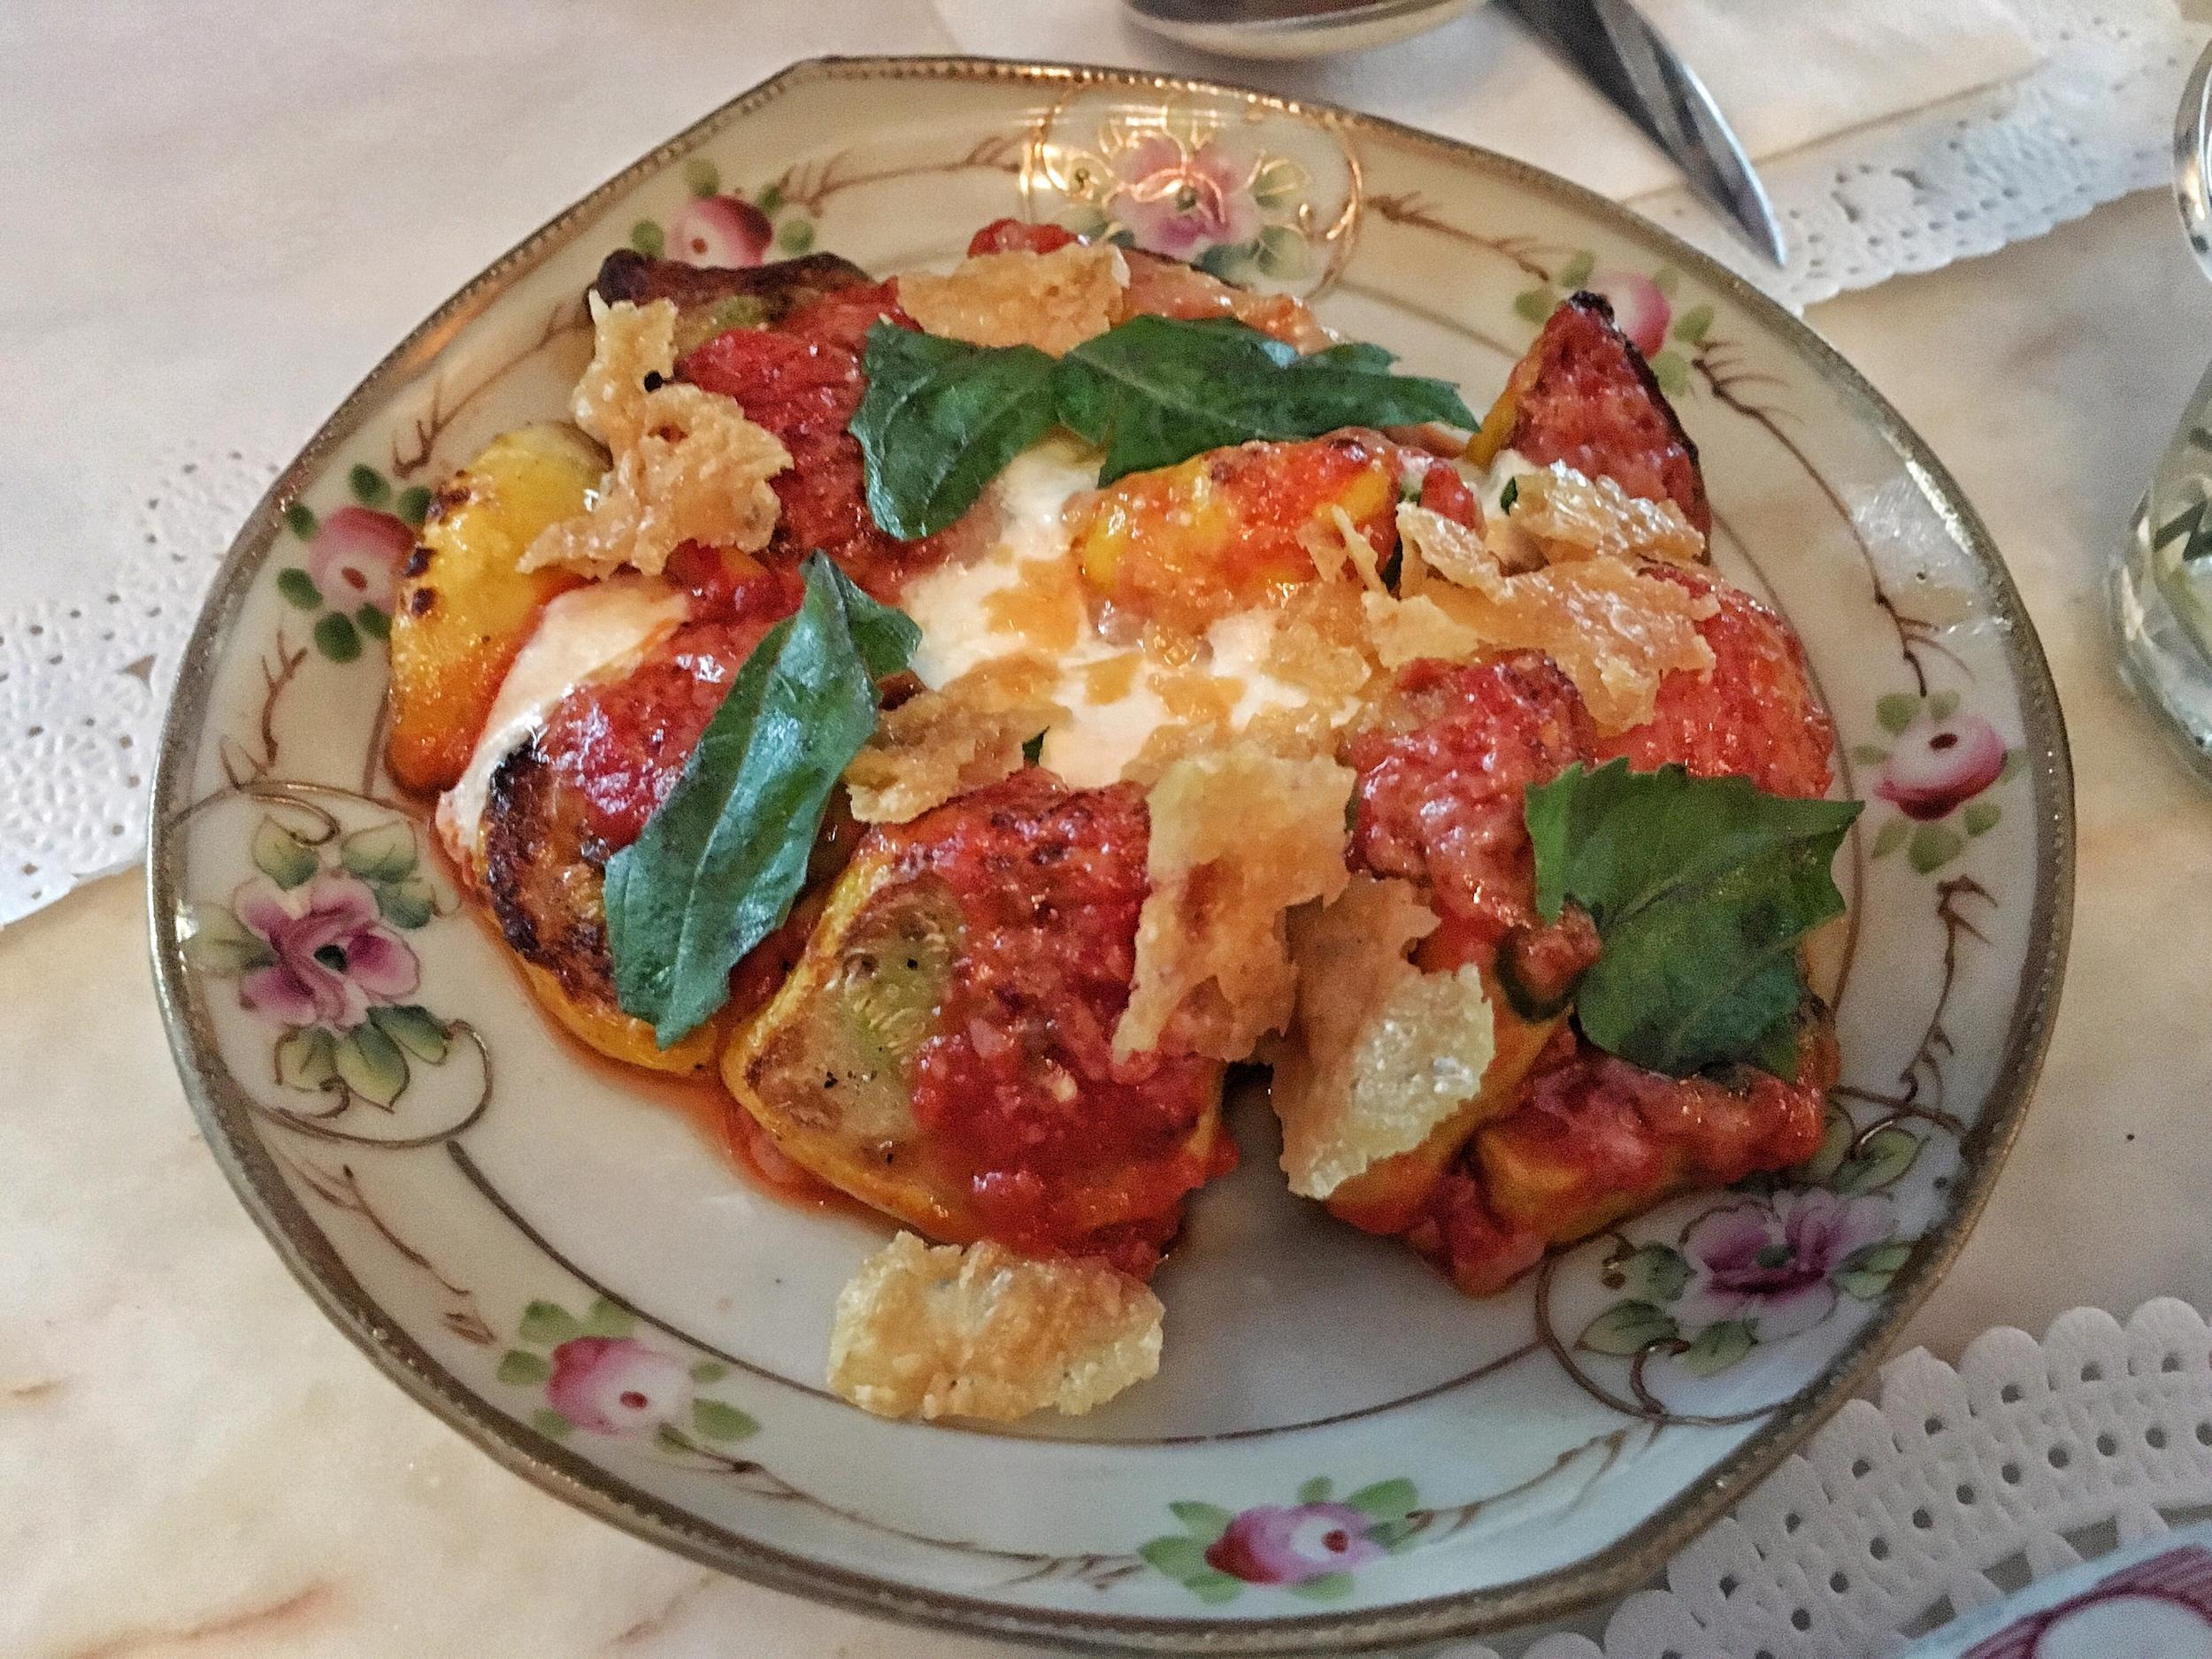 Squash with mozzarella, spicy tomato sauce and basil